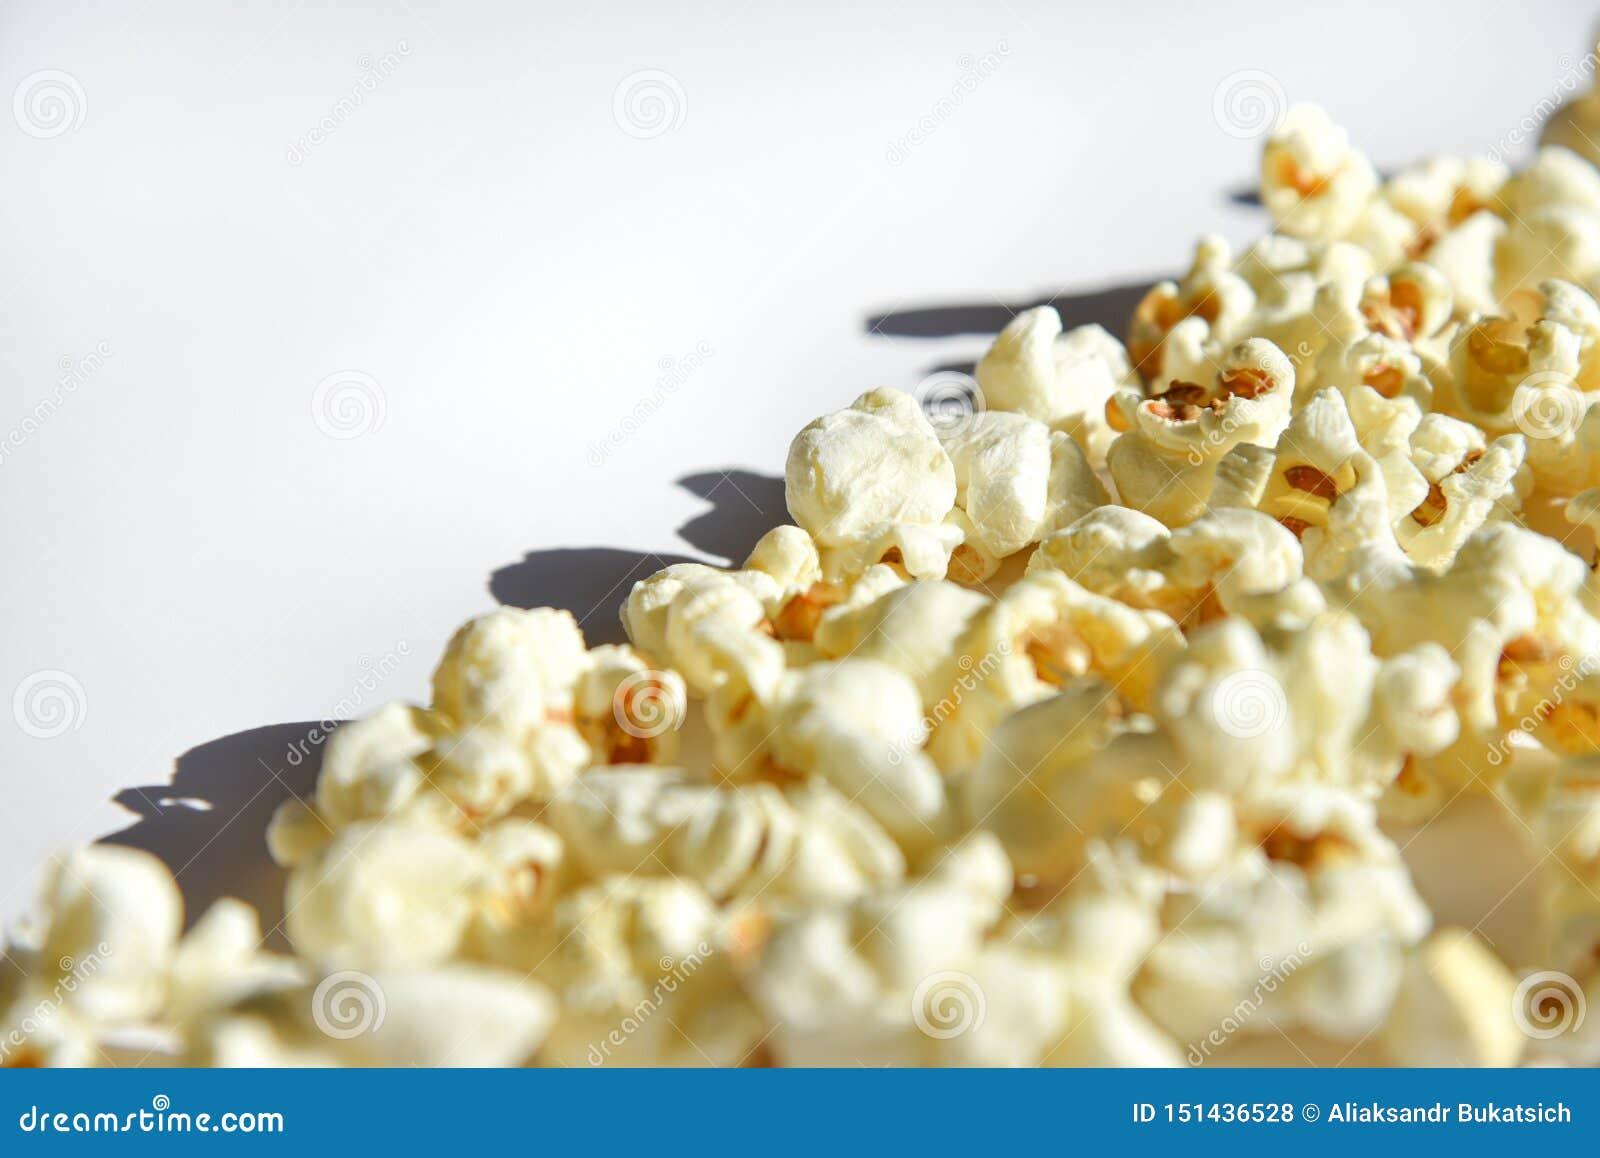 Popcorn isolato su fondo bianco